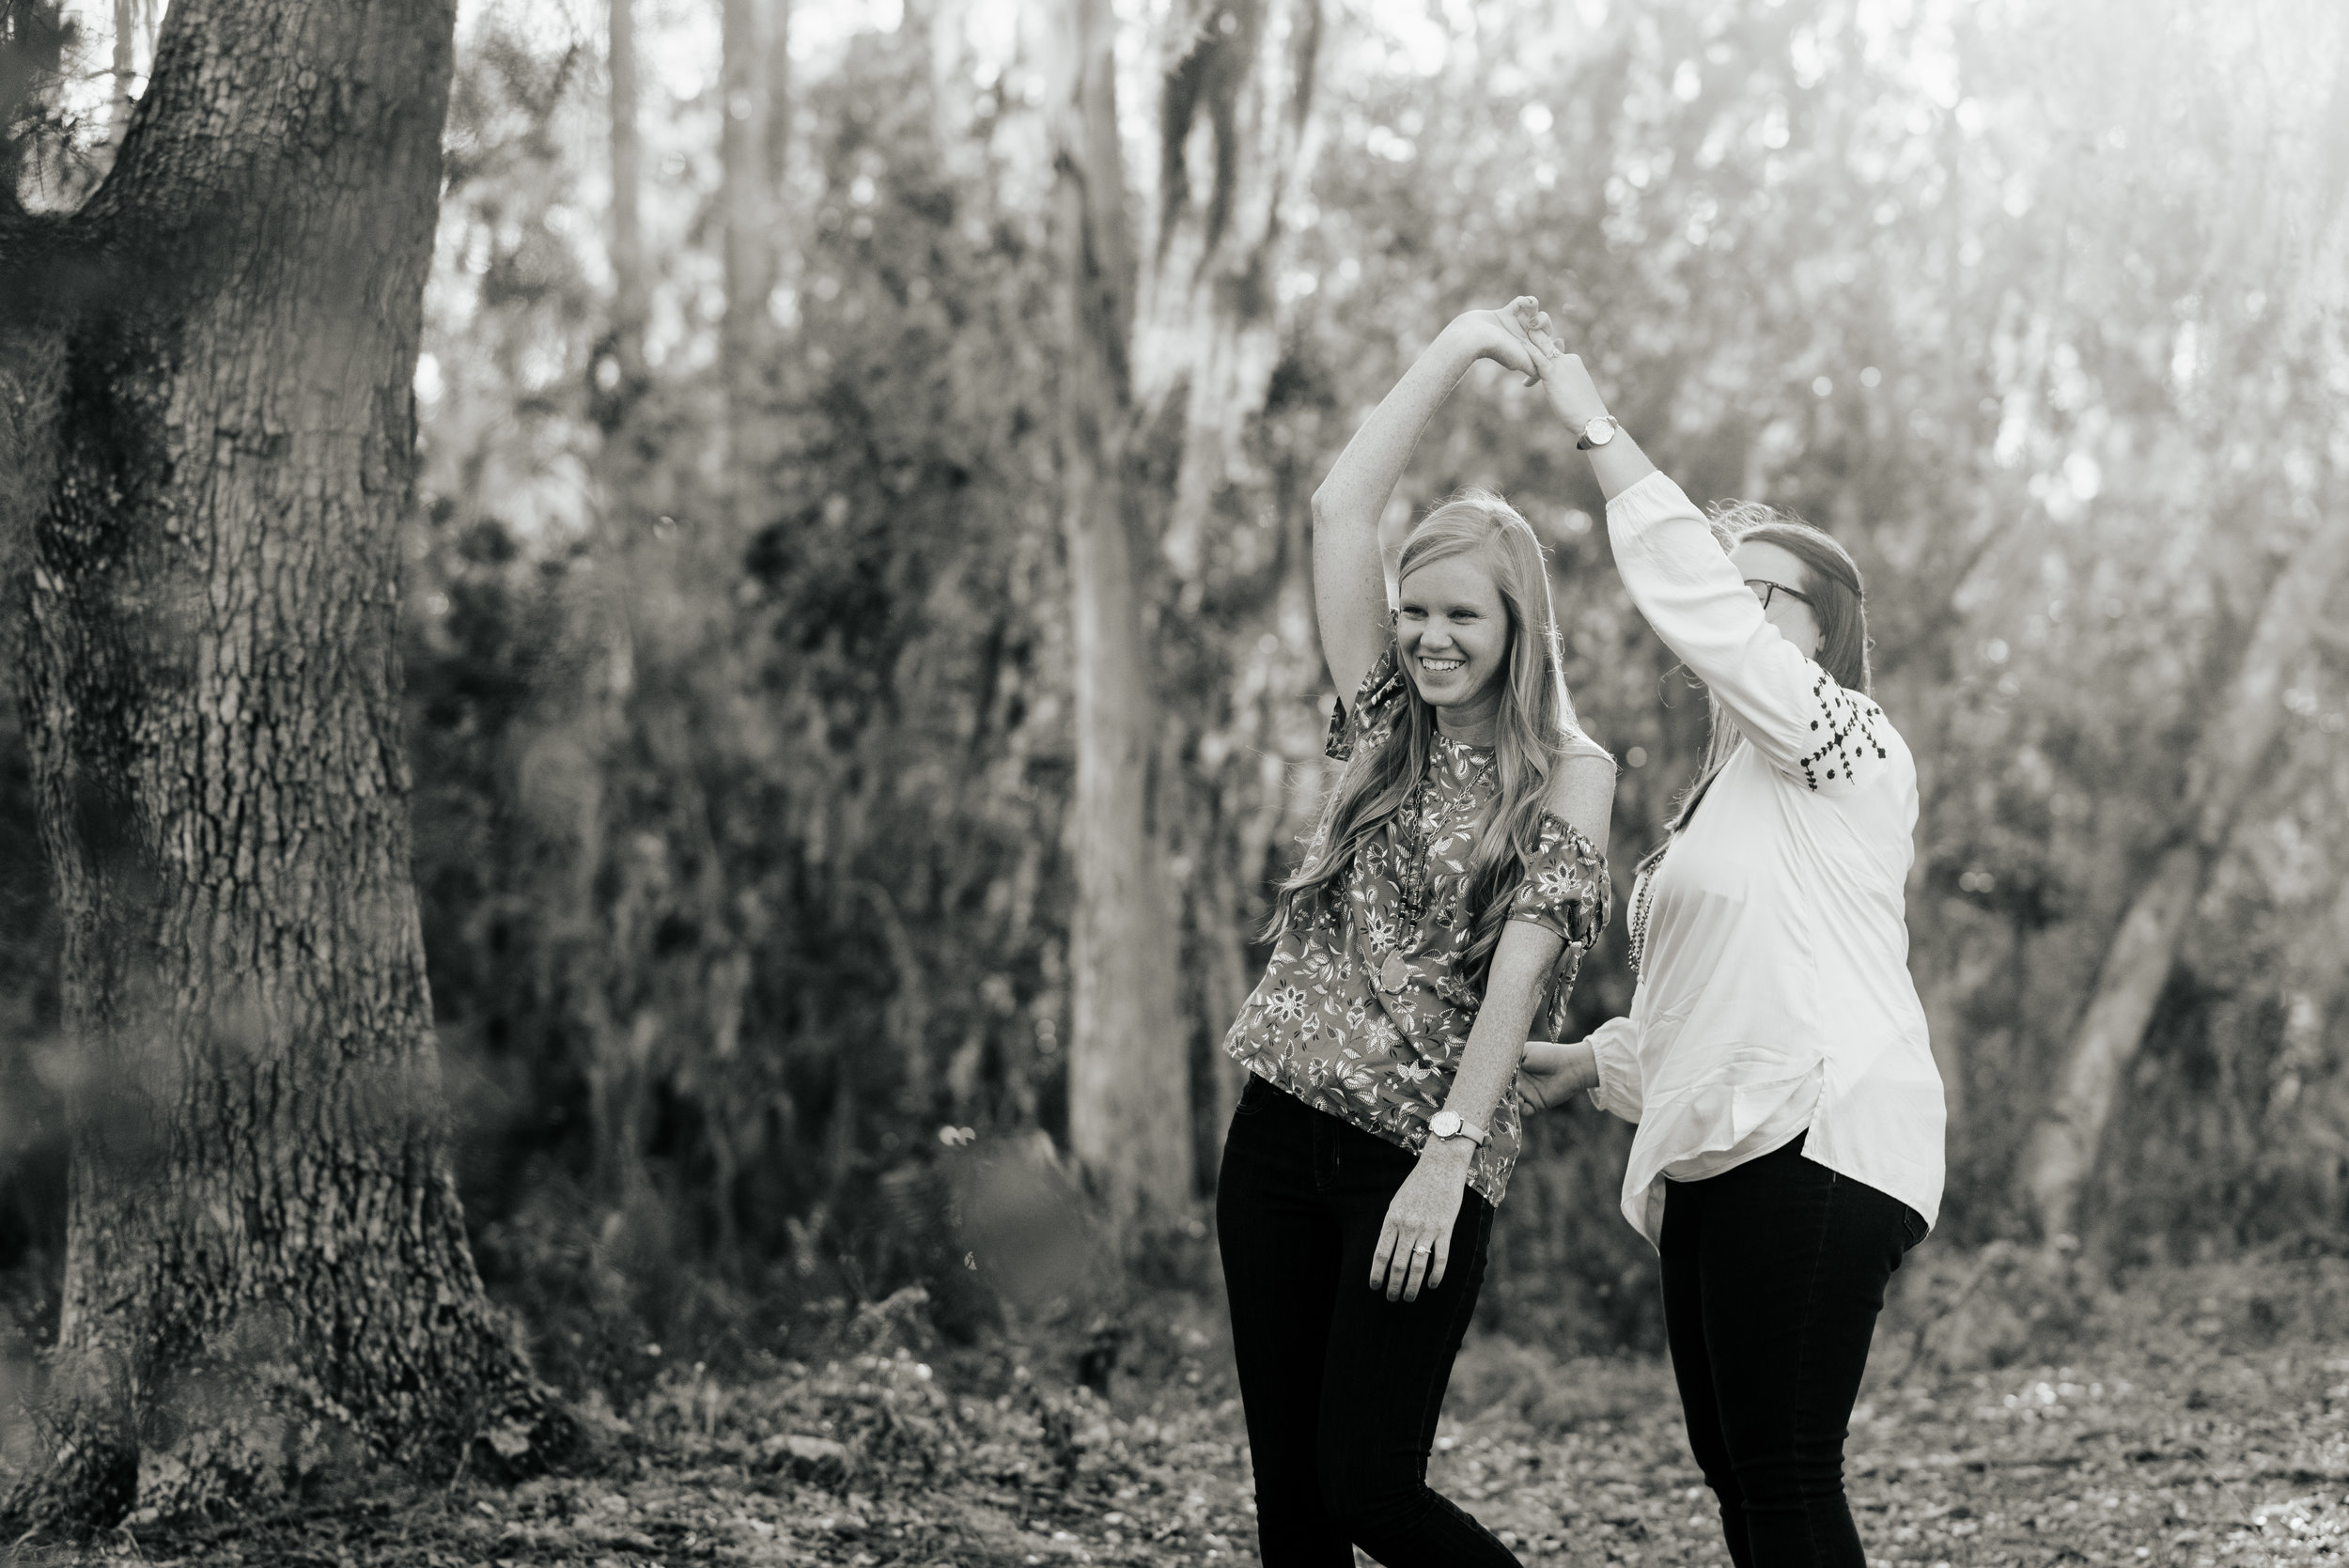 Brooke-April-Engagement-0057.jpg